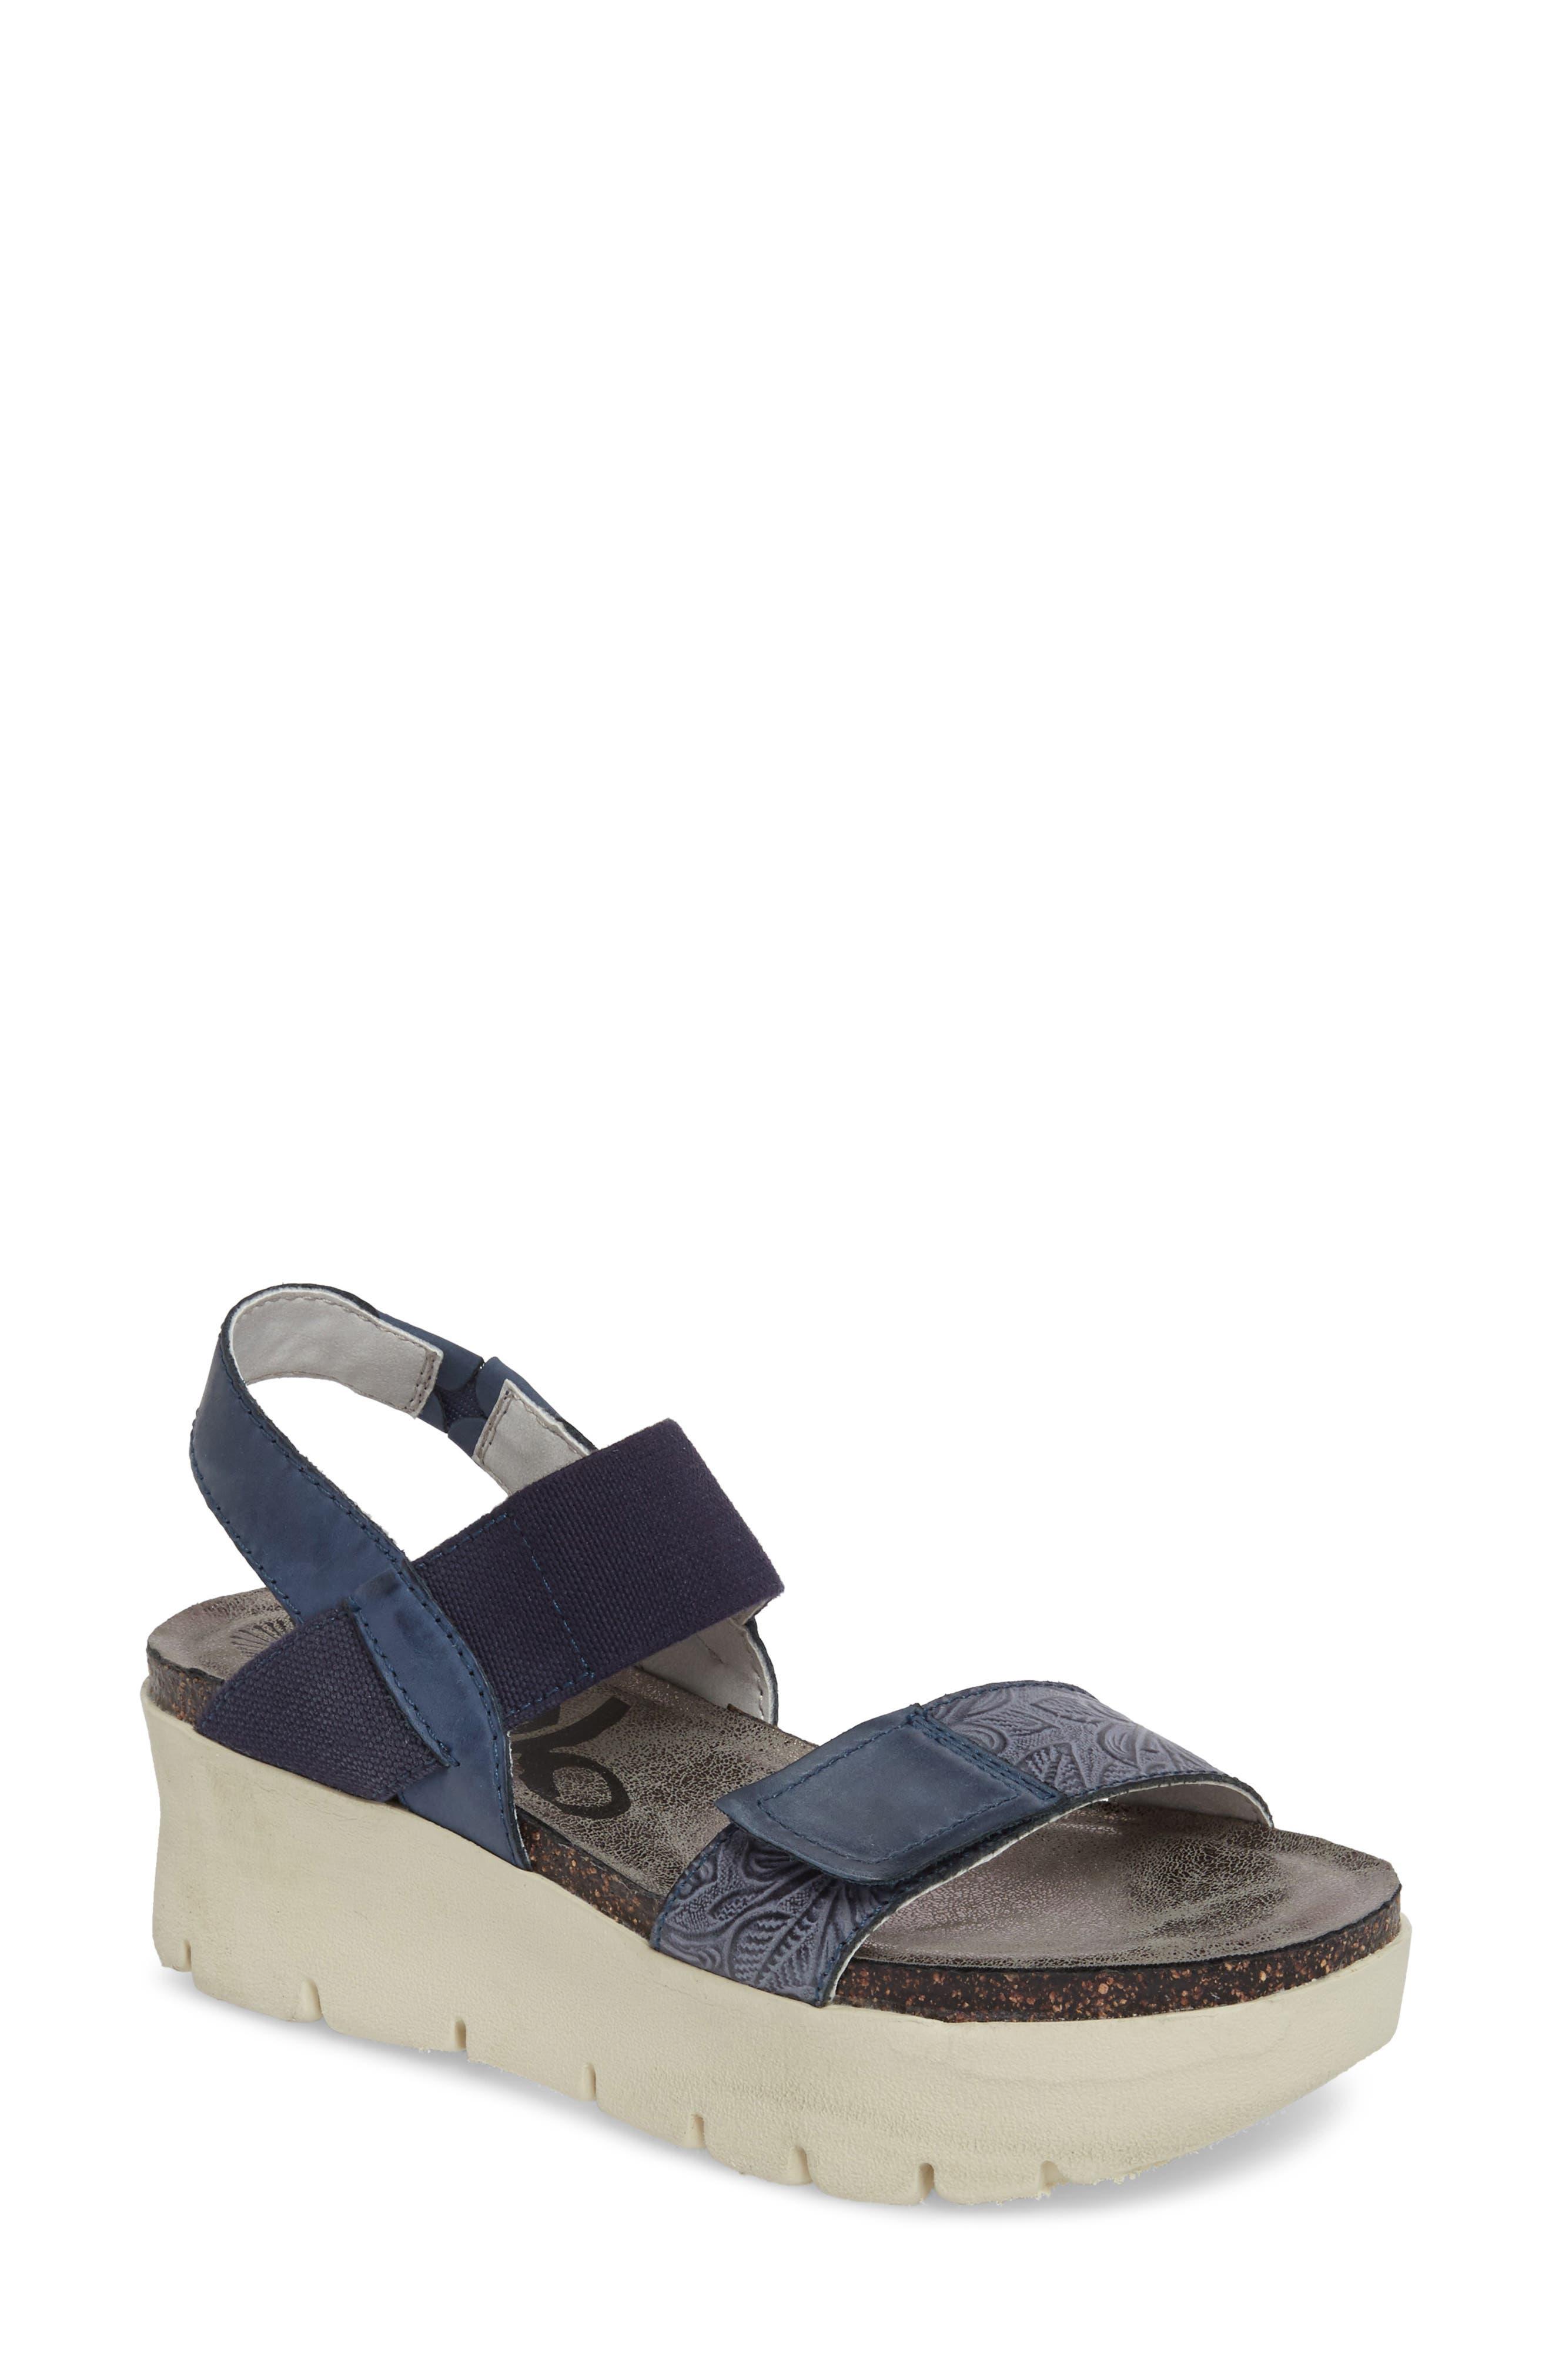 Nova Platform Sandal,                             Main thumbnail 1, color,                             Navy Leather